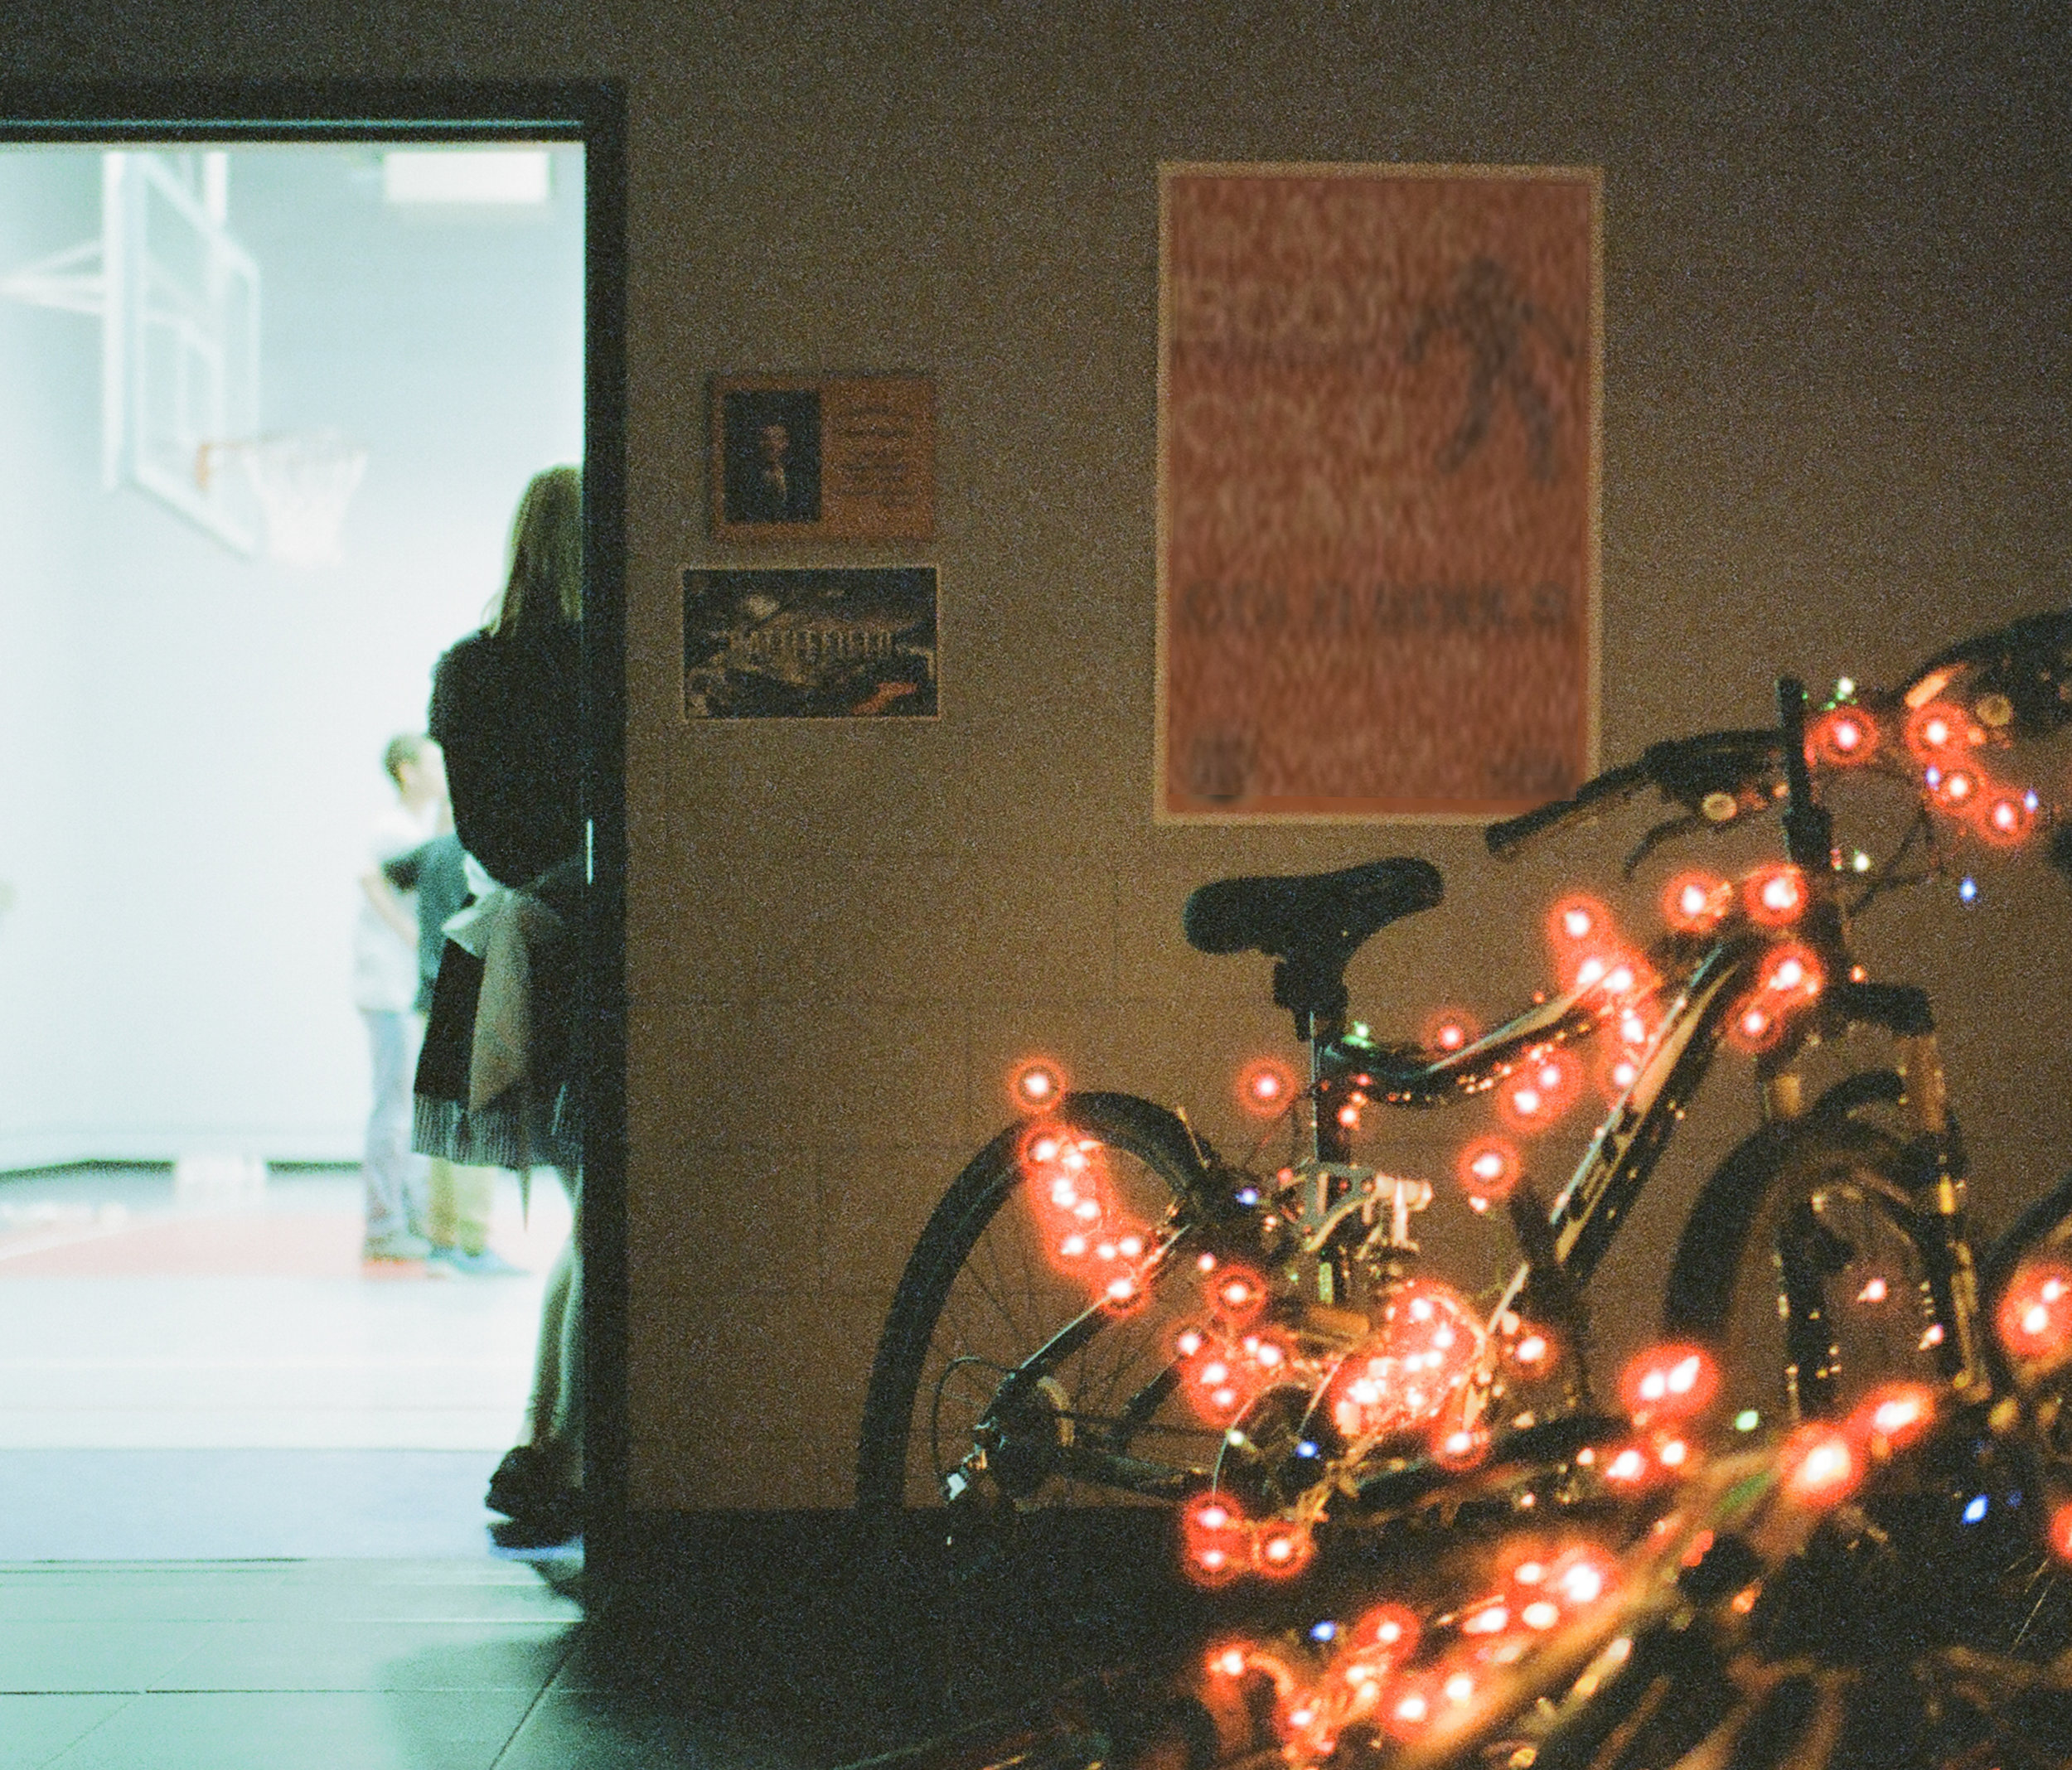 cinestill-halation-red-lights-bikes-gym